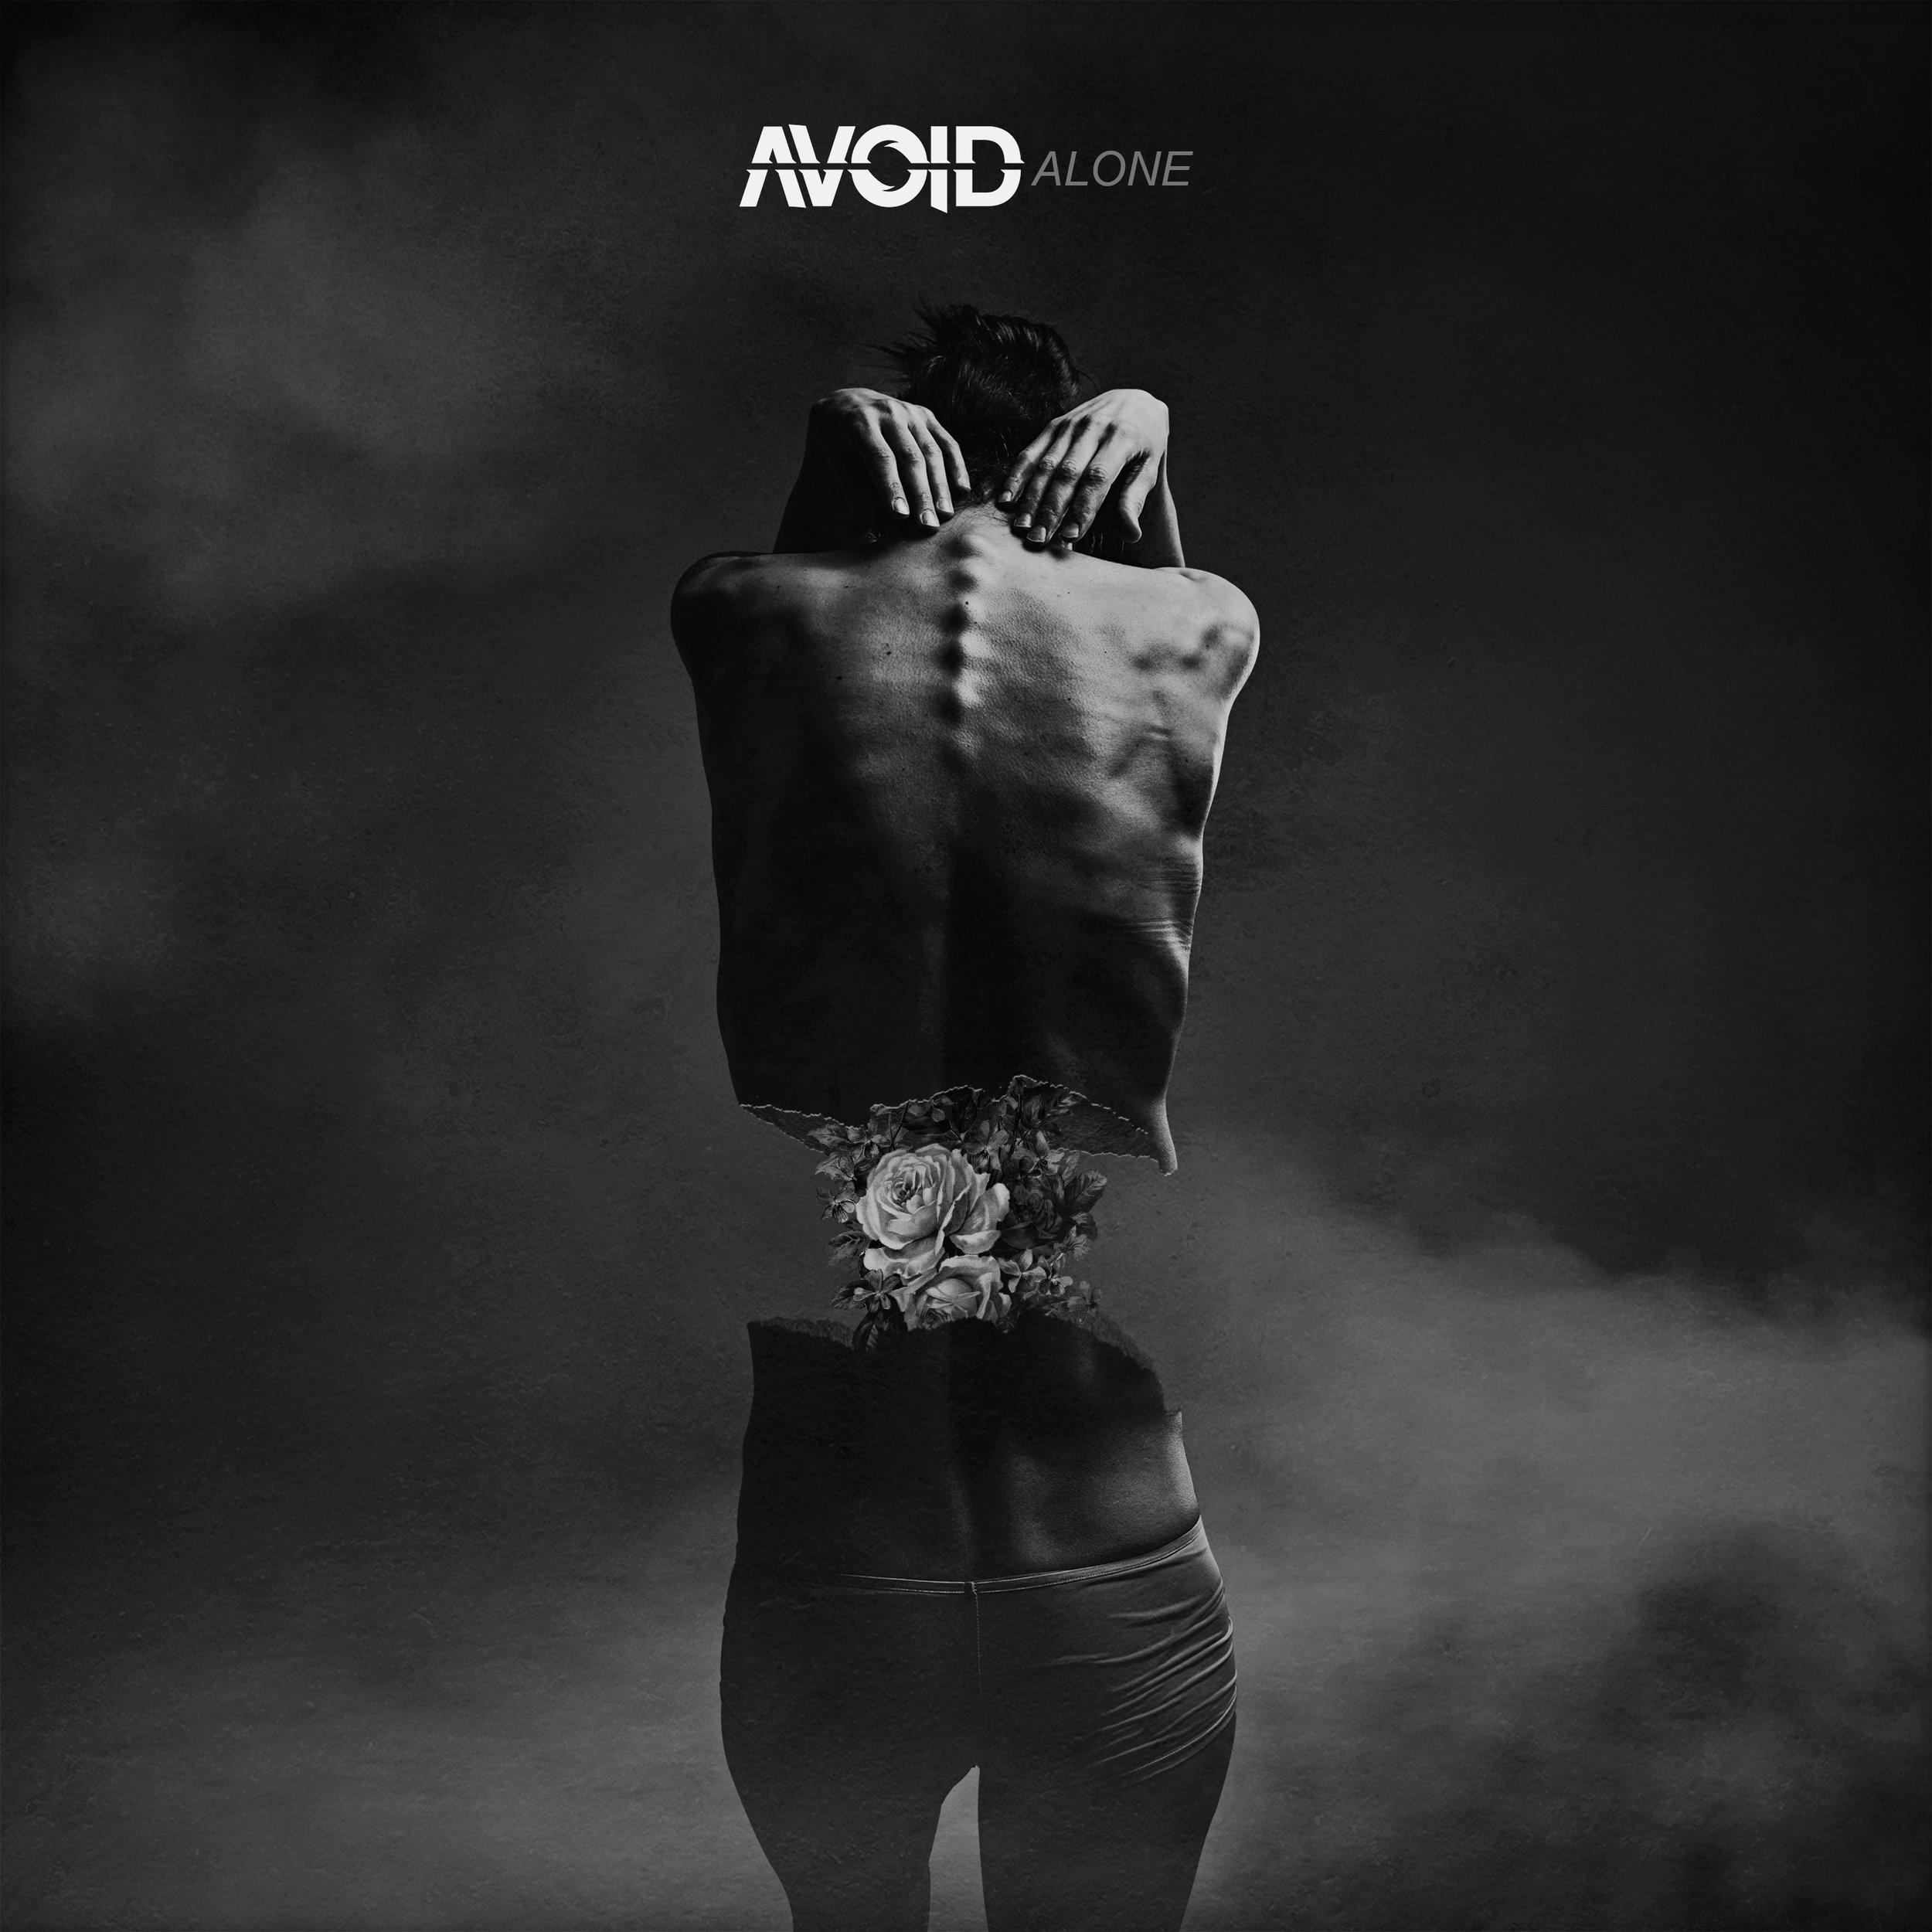 AVOID - Hate (Me)